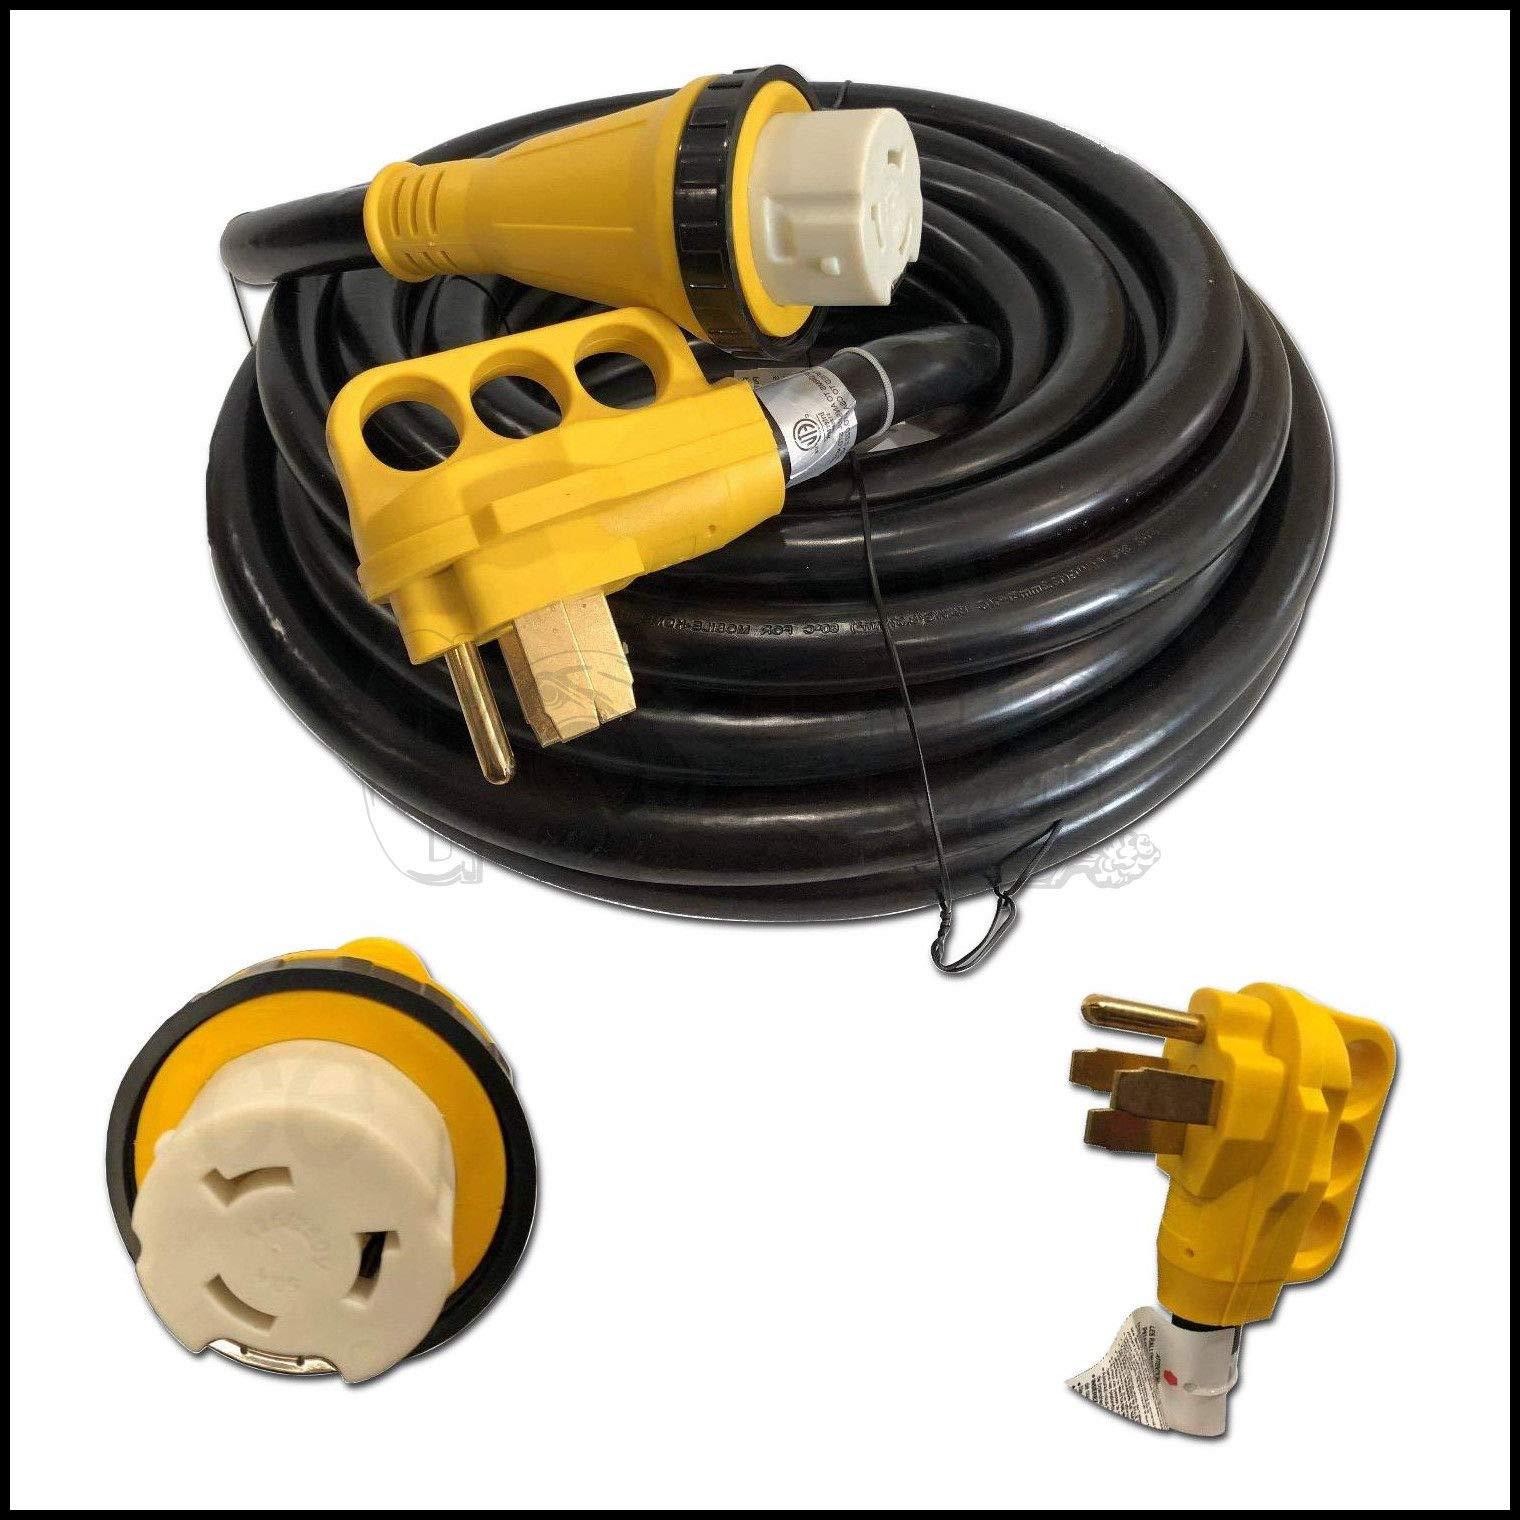 EnergyPlug New 50 Foot 50A RV Extension Cord Adapter Shore Power NEMA 14-50P to SS2-50R